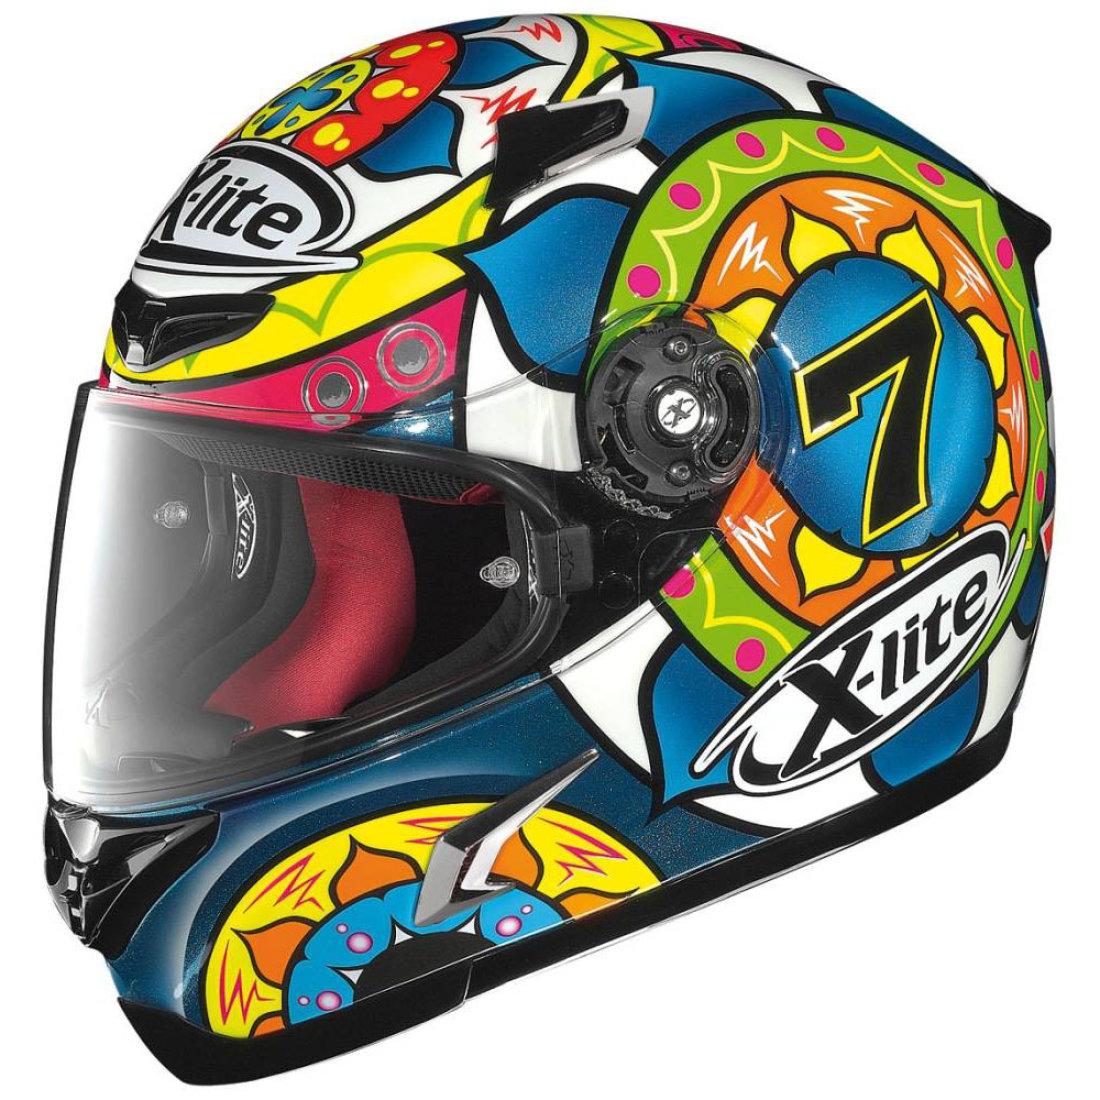 x lite x 802r chaz davies sepang helmet motocard